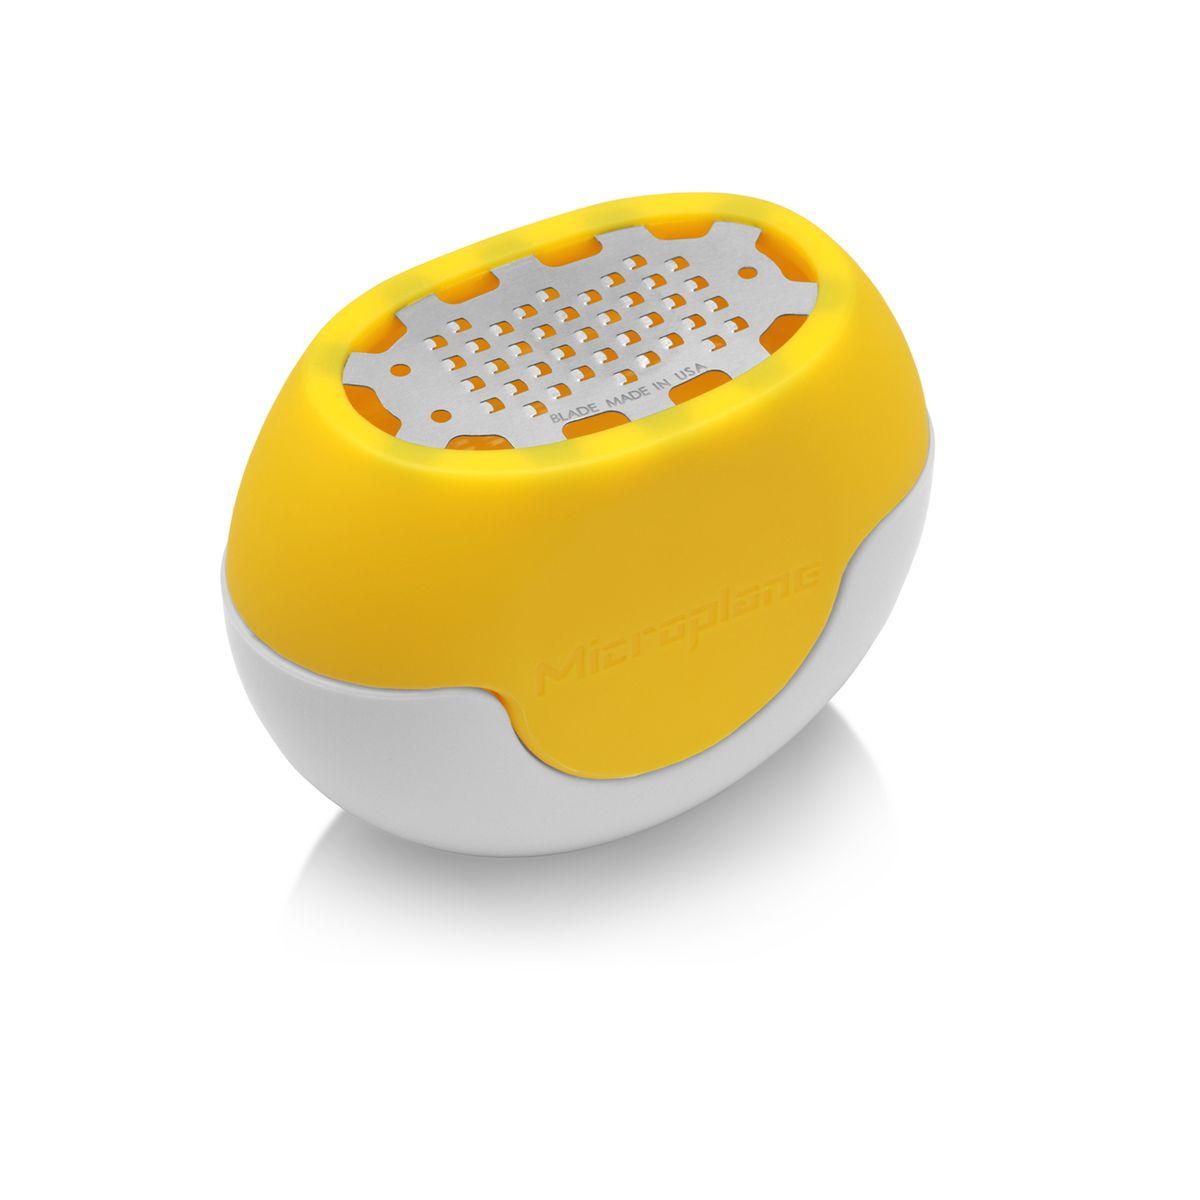 Zesteur flexi zesti jaune - Microplane